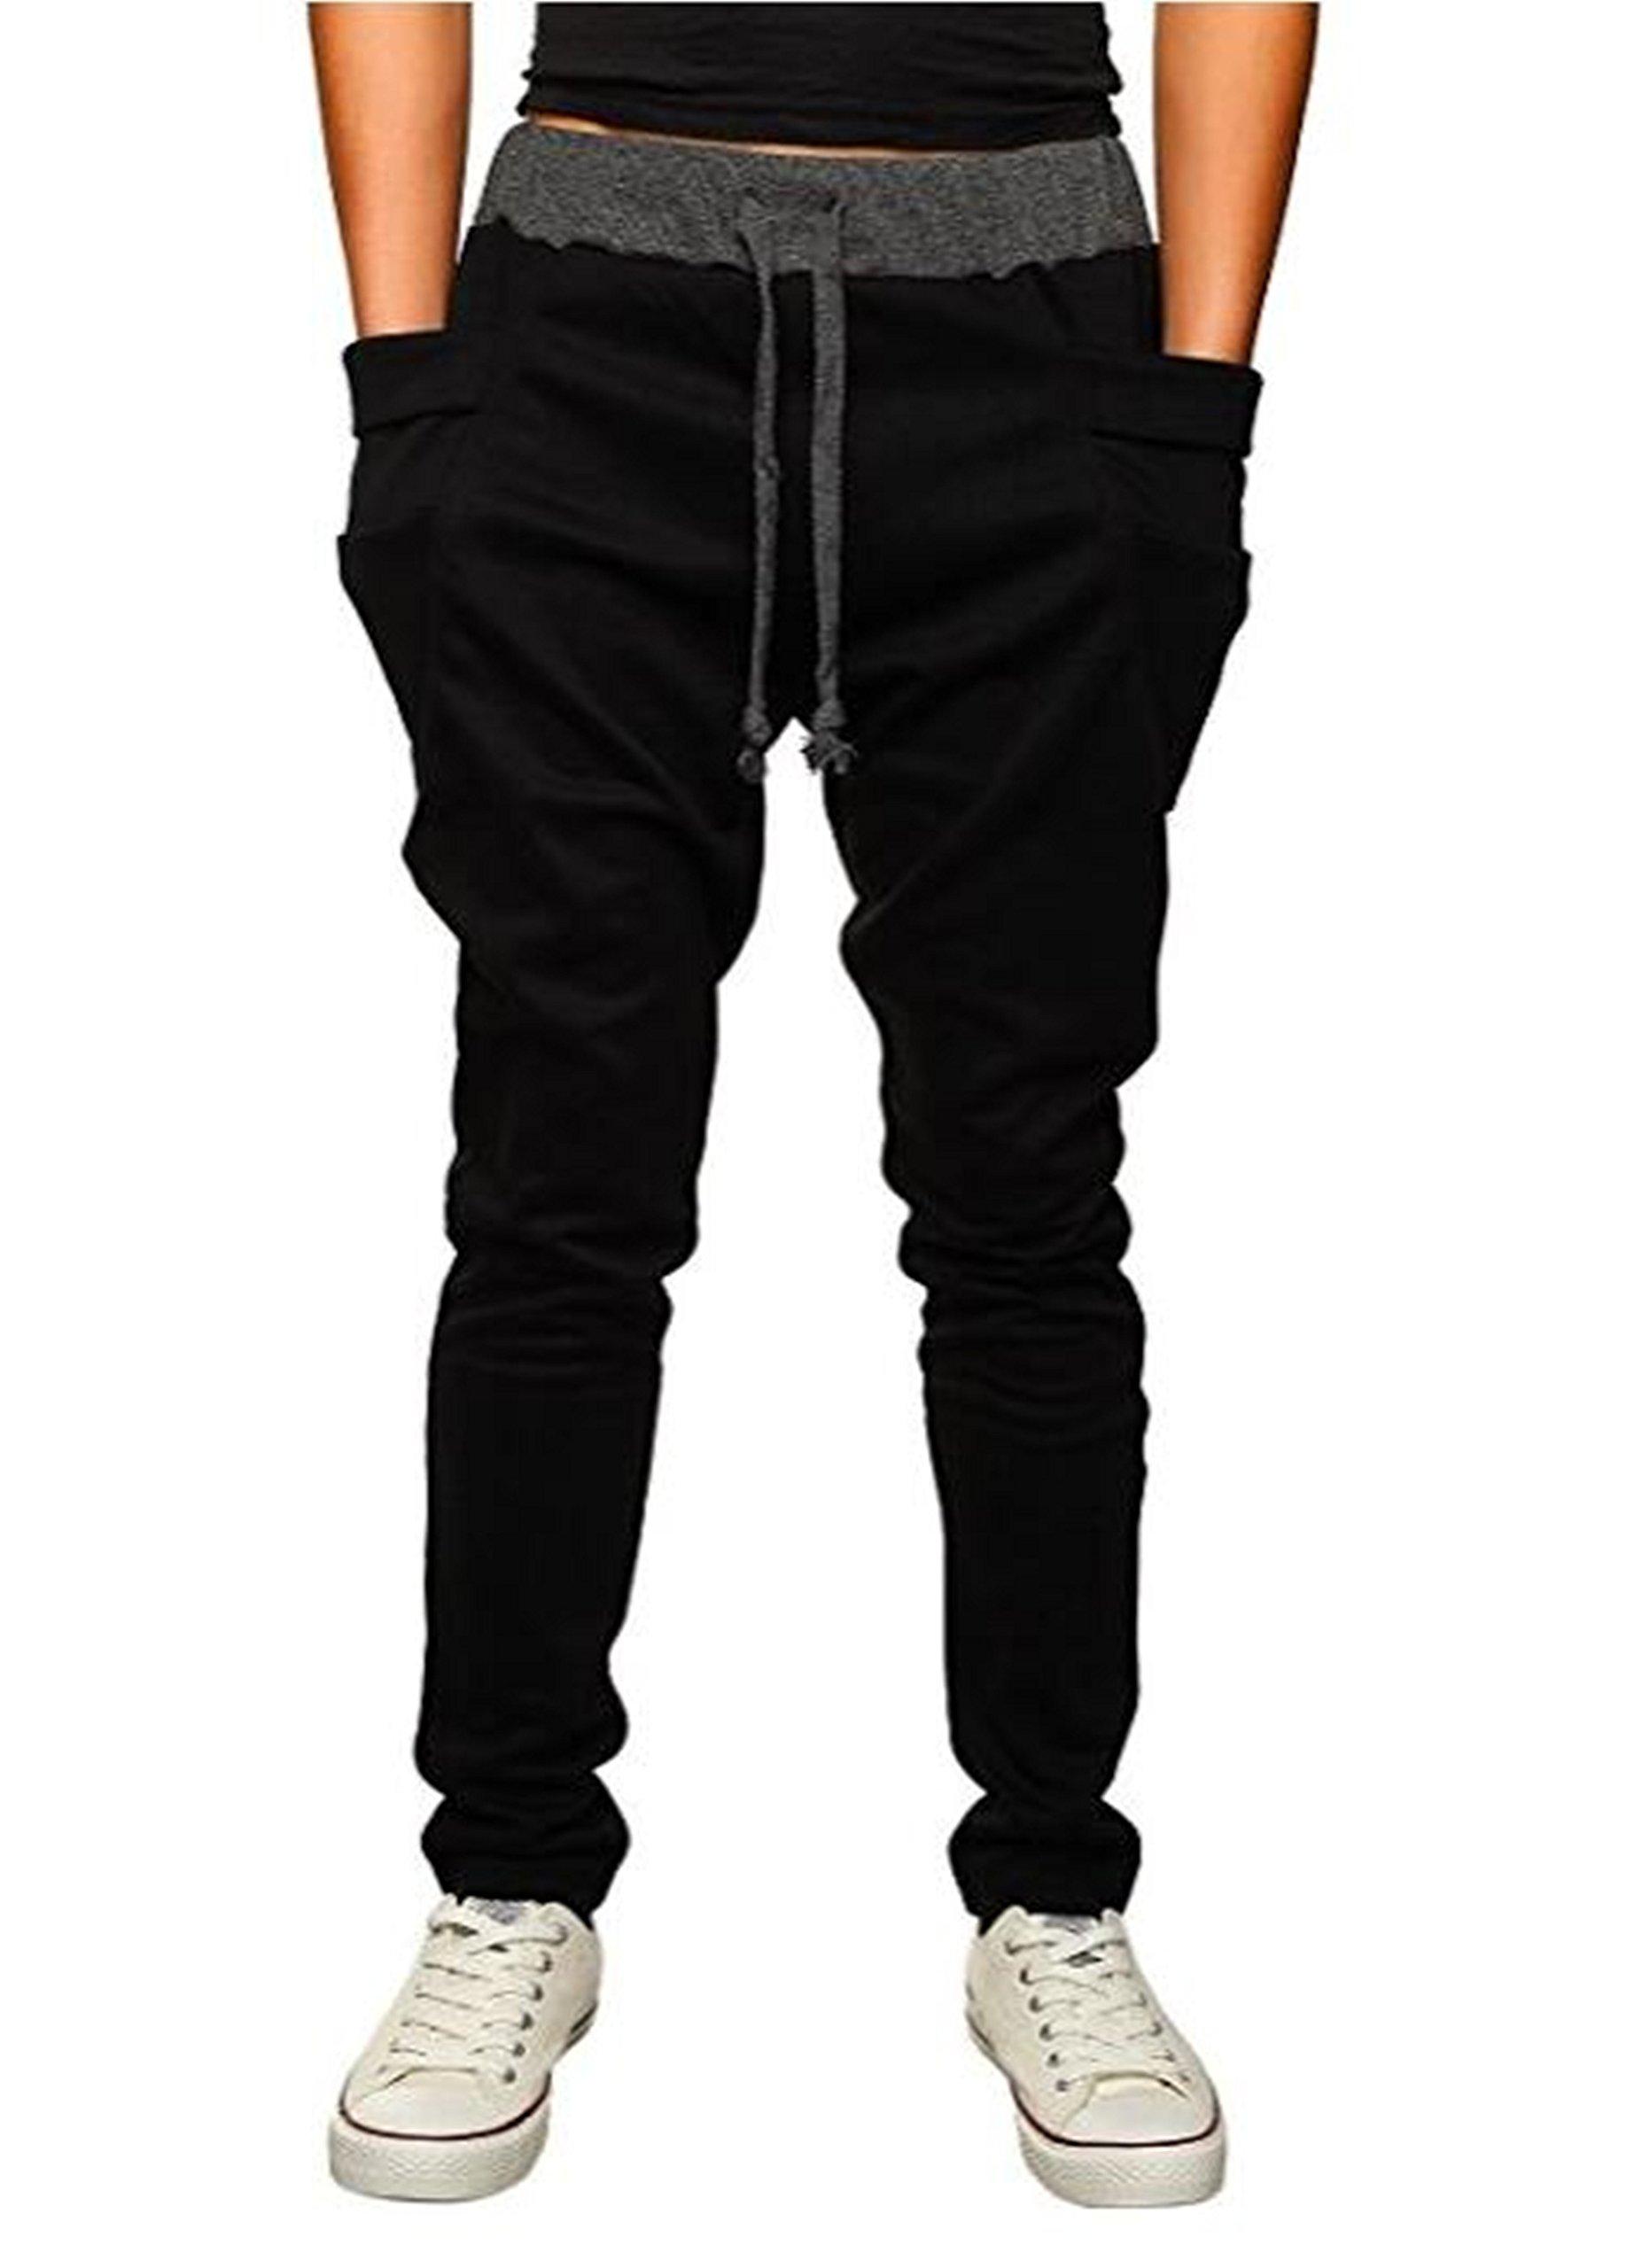 OBT Boy's Black Slim Casual Cotton Comfy Skinny Running Jogger Pants 10